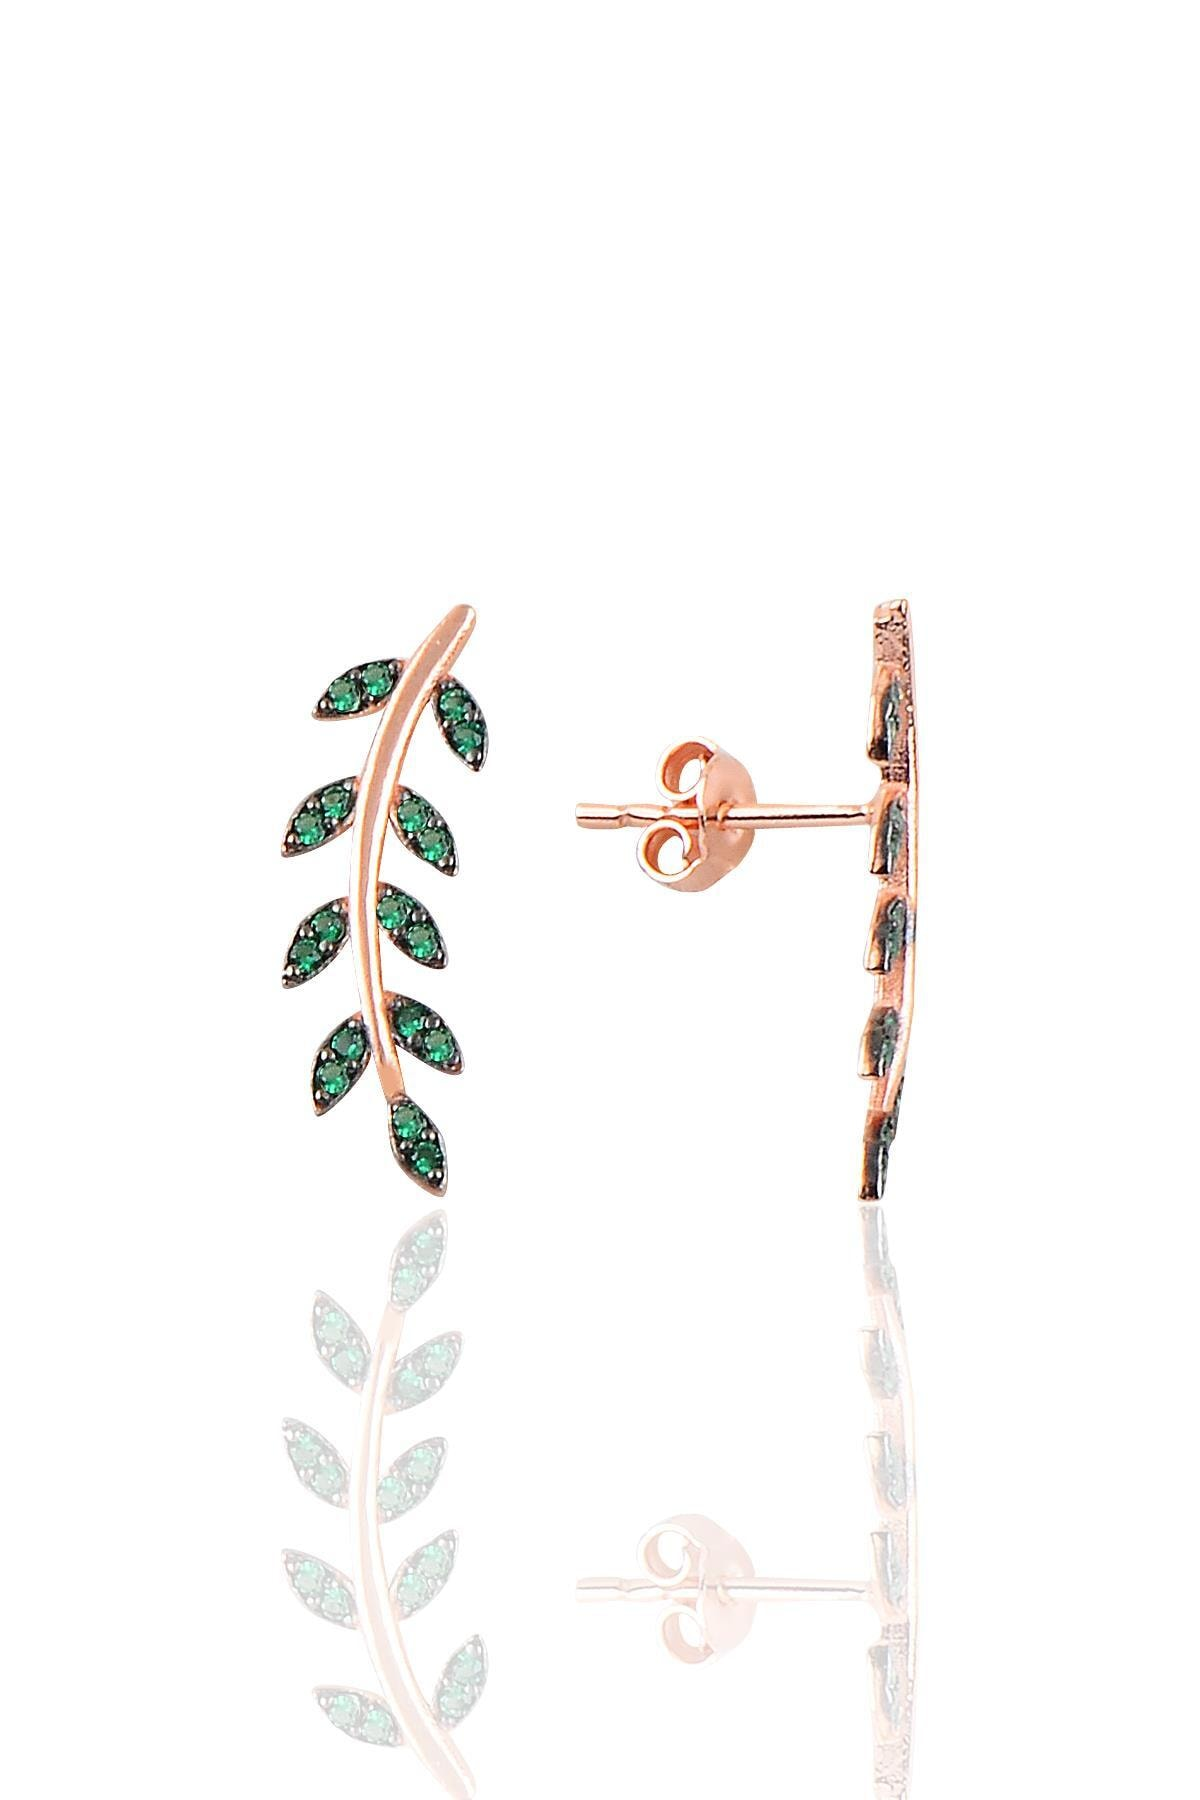 Söğütlü Silver Gümüş rose yeşil  taşlı yaprak  üçlü set 3